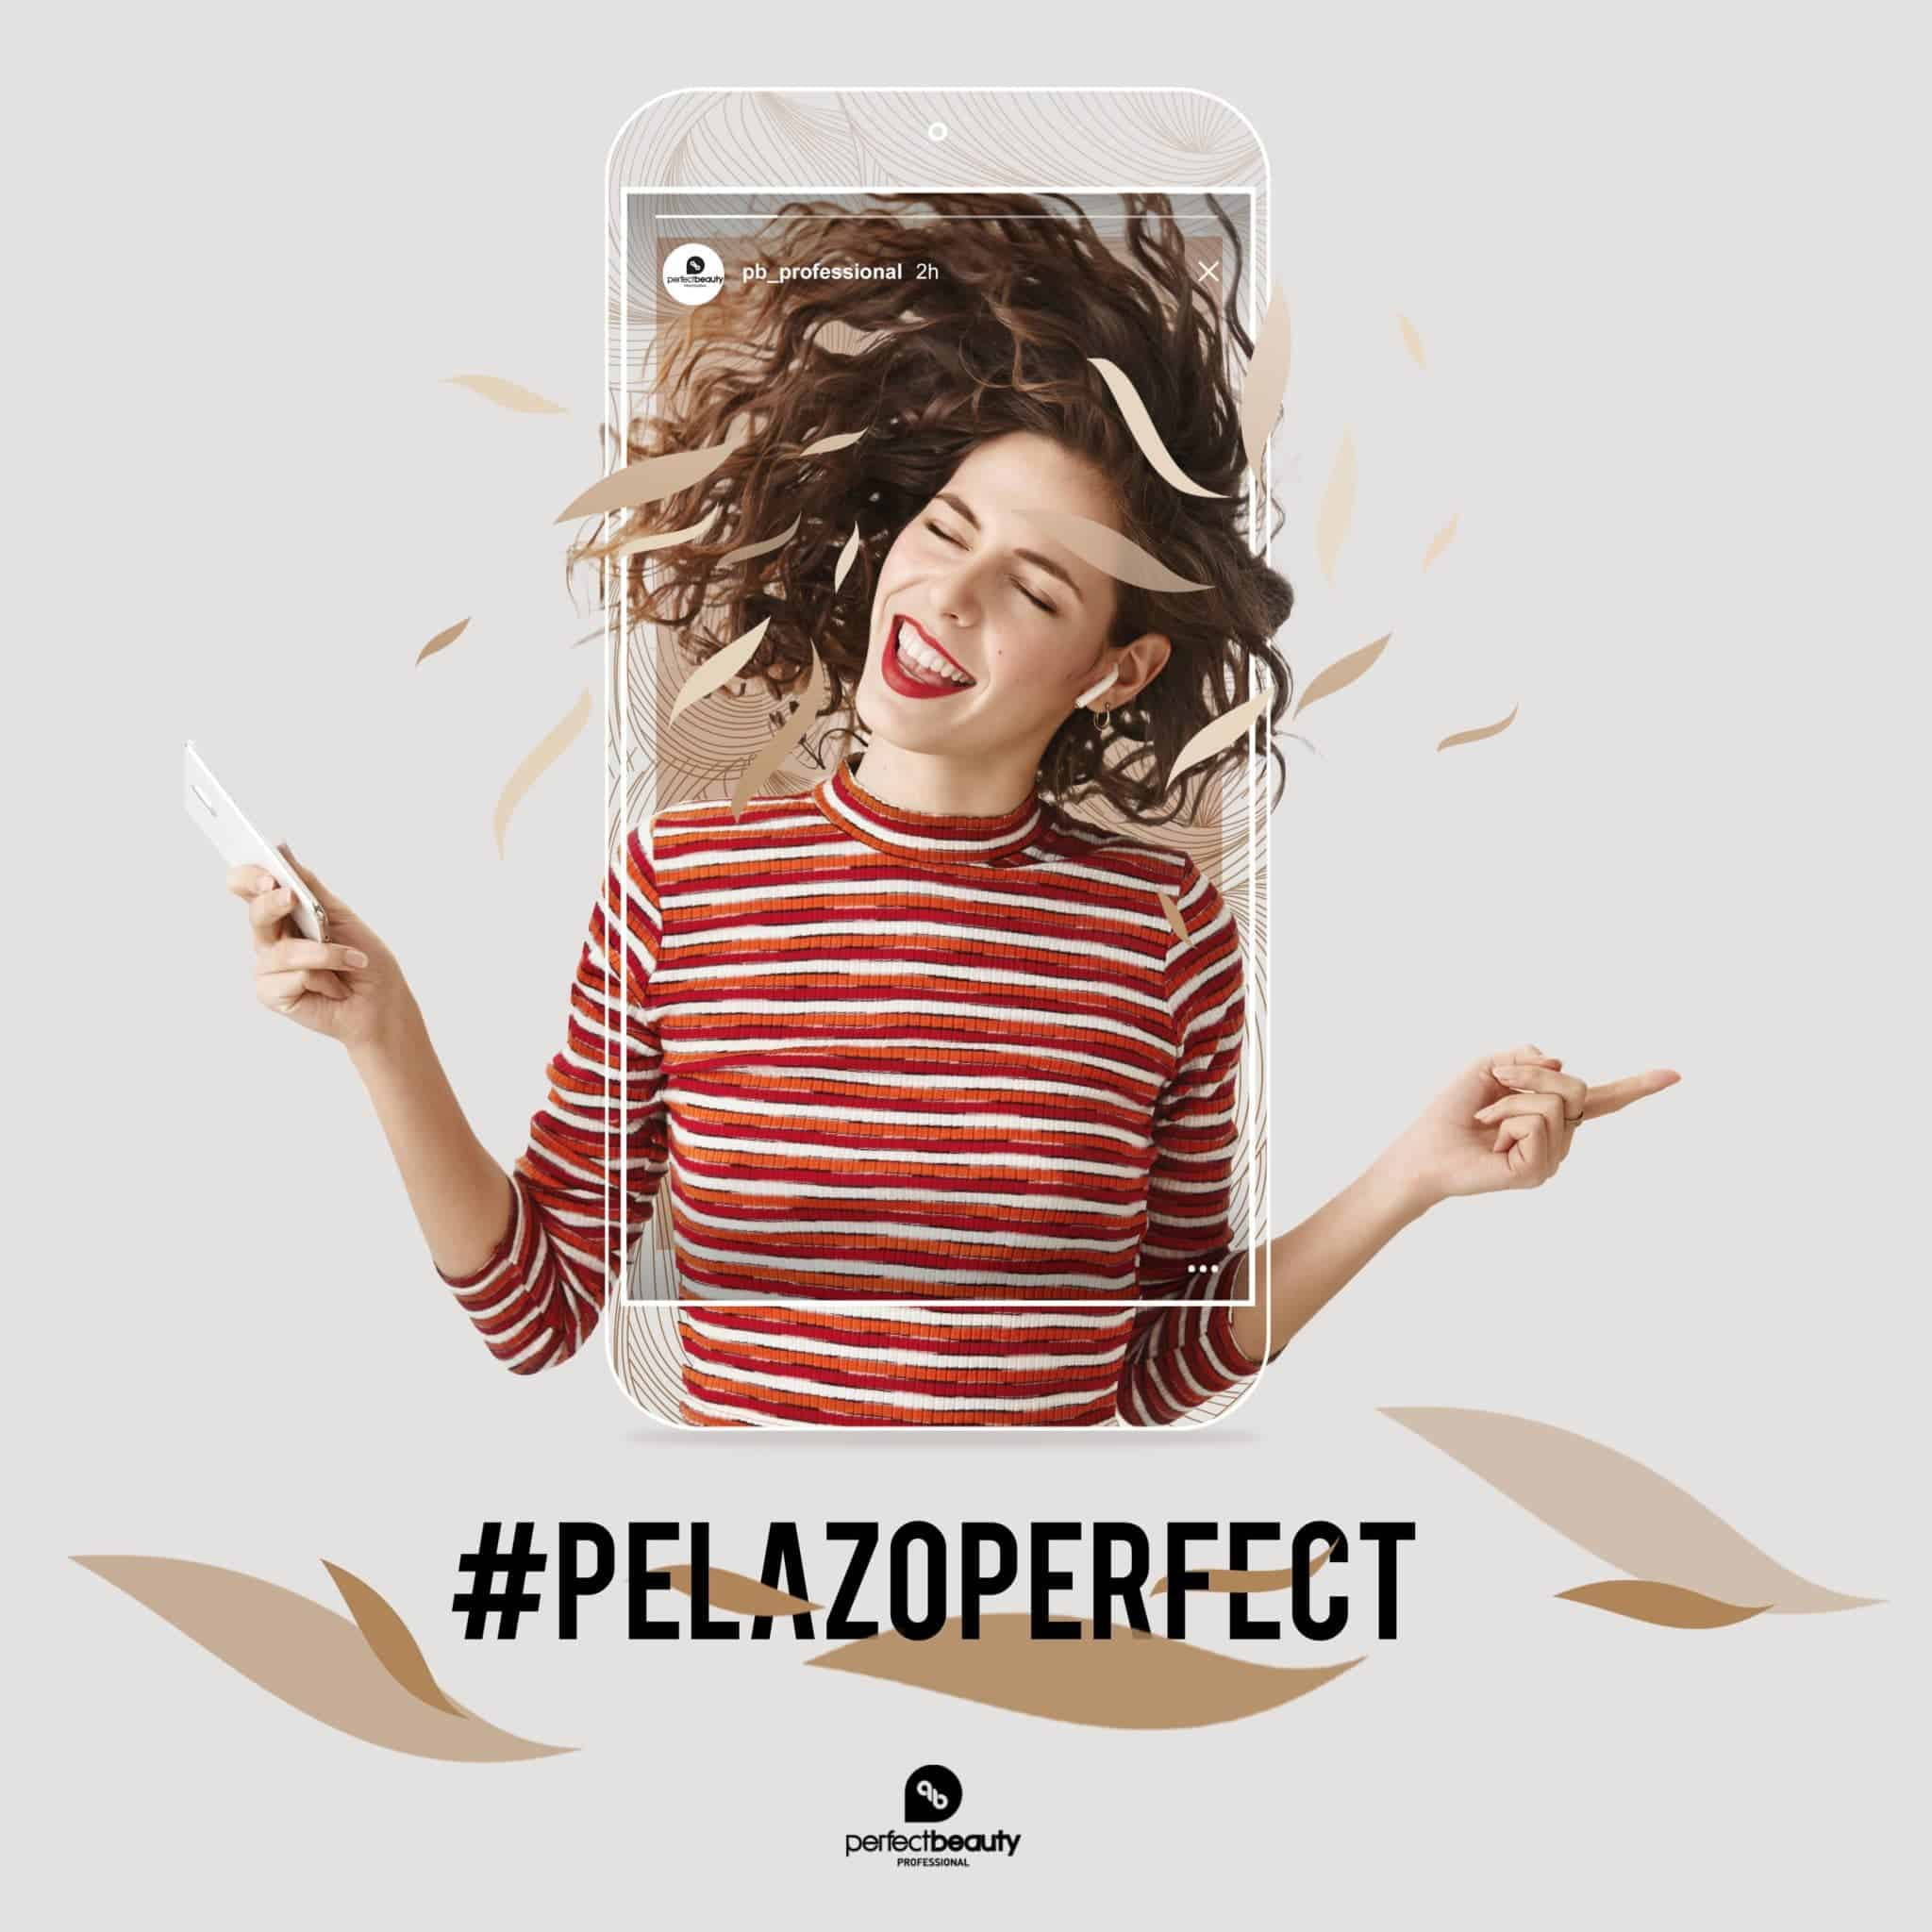 Campaña de marketing de influencers para Perfect Beauty 13